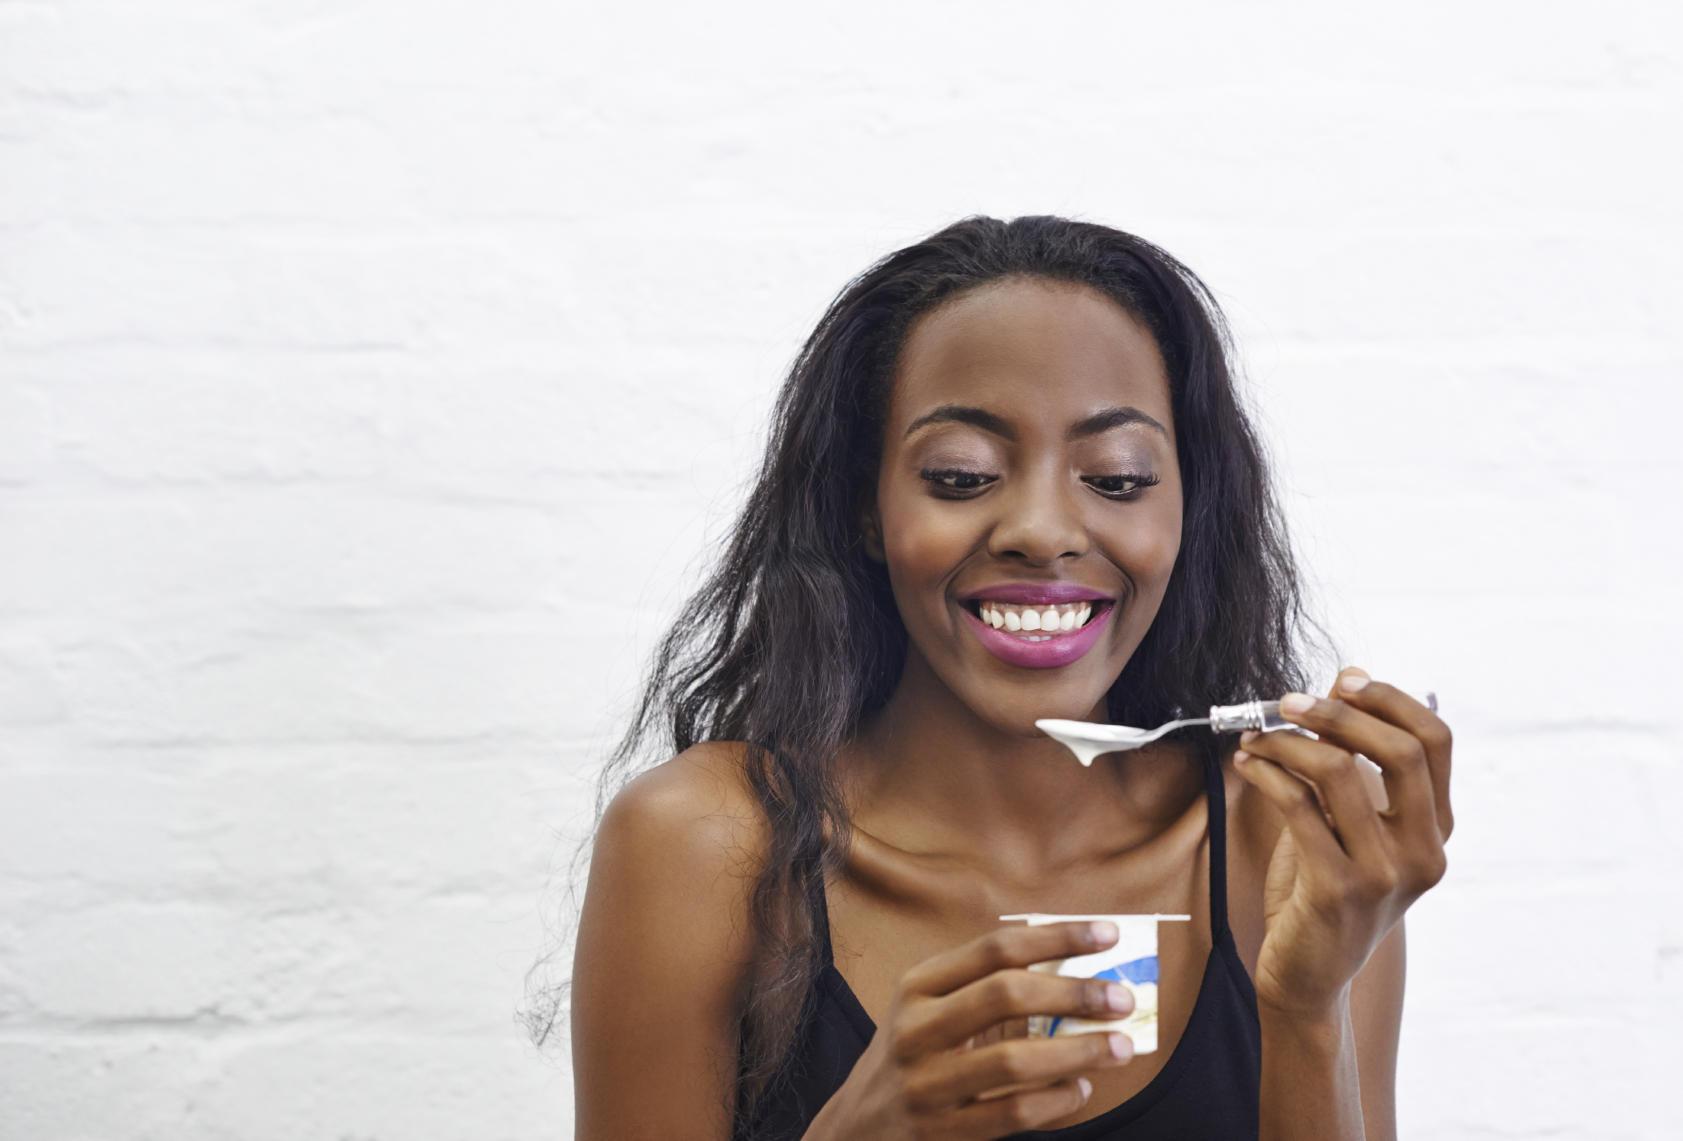 woman eating yogurt